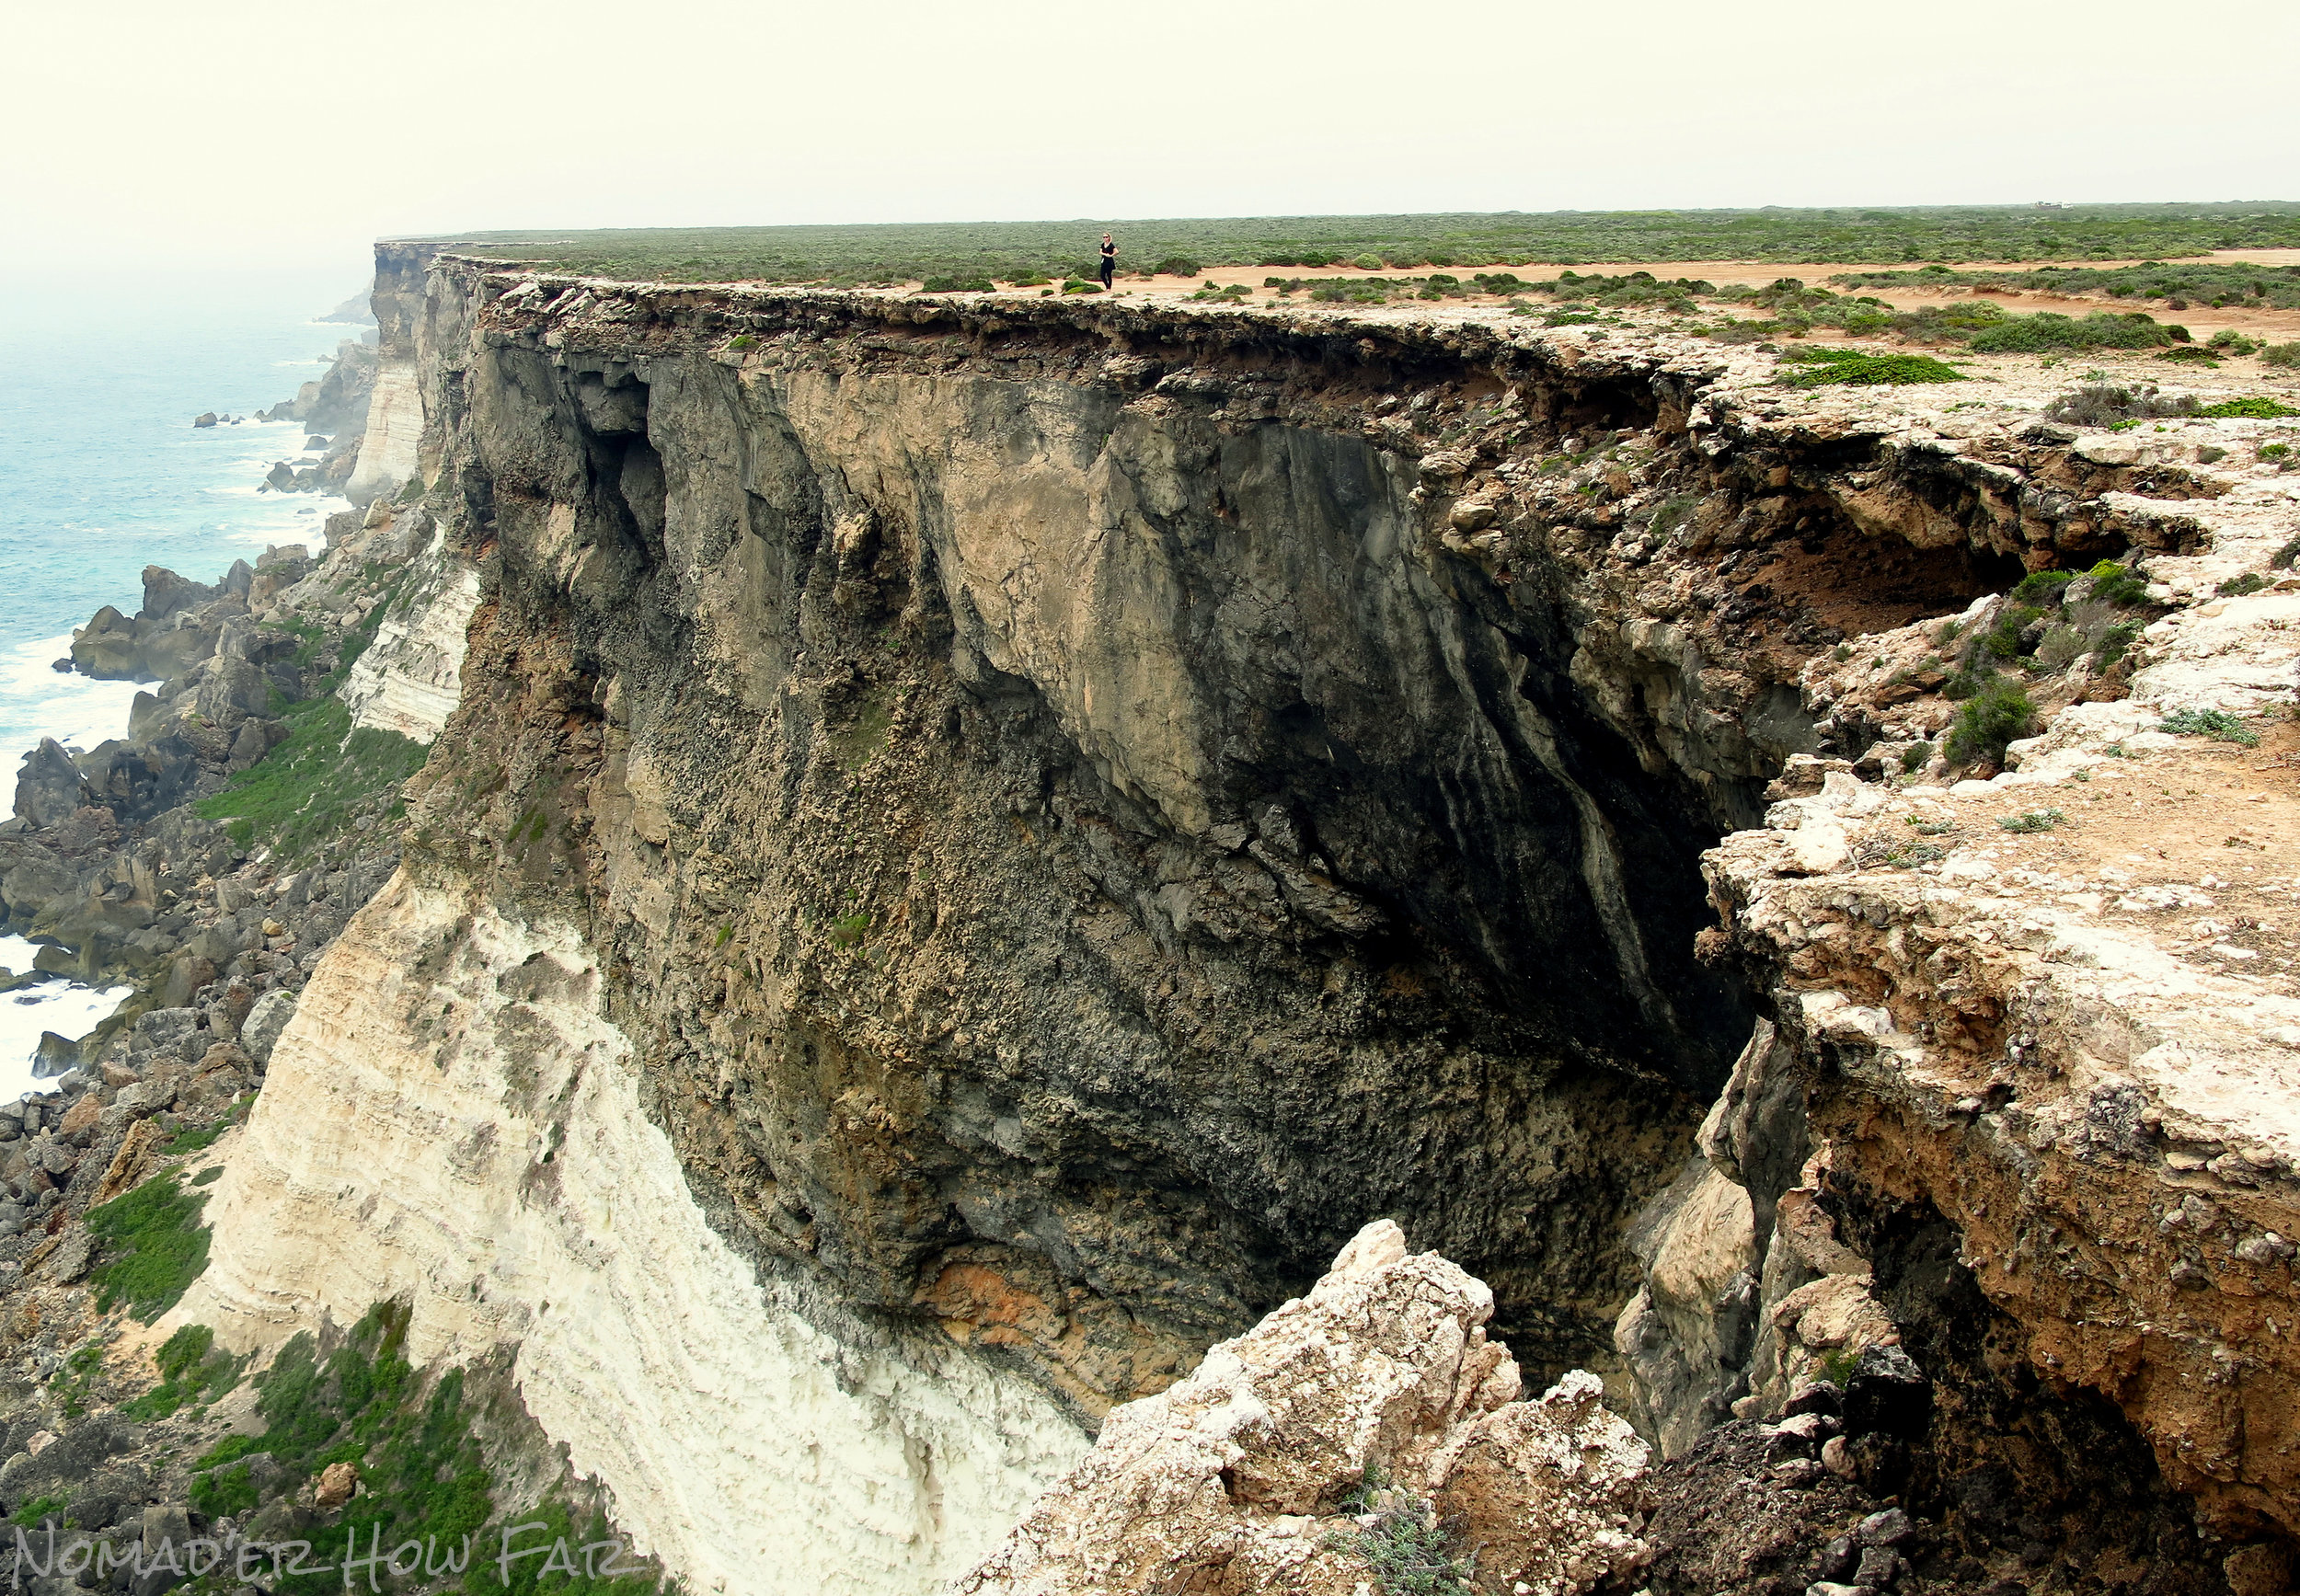 Southern cliffs, Australia